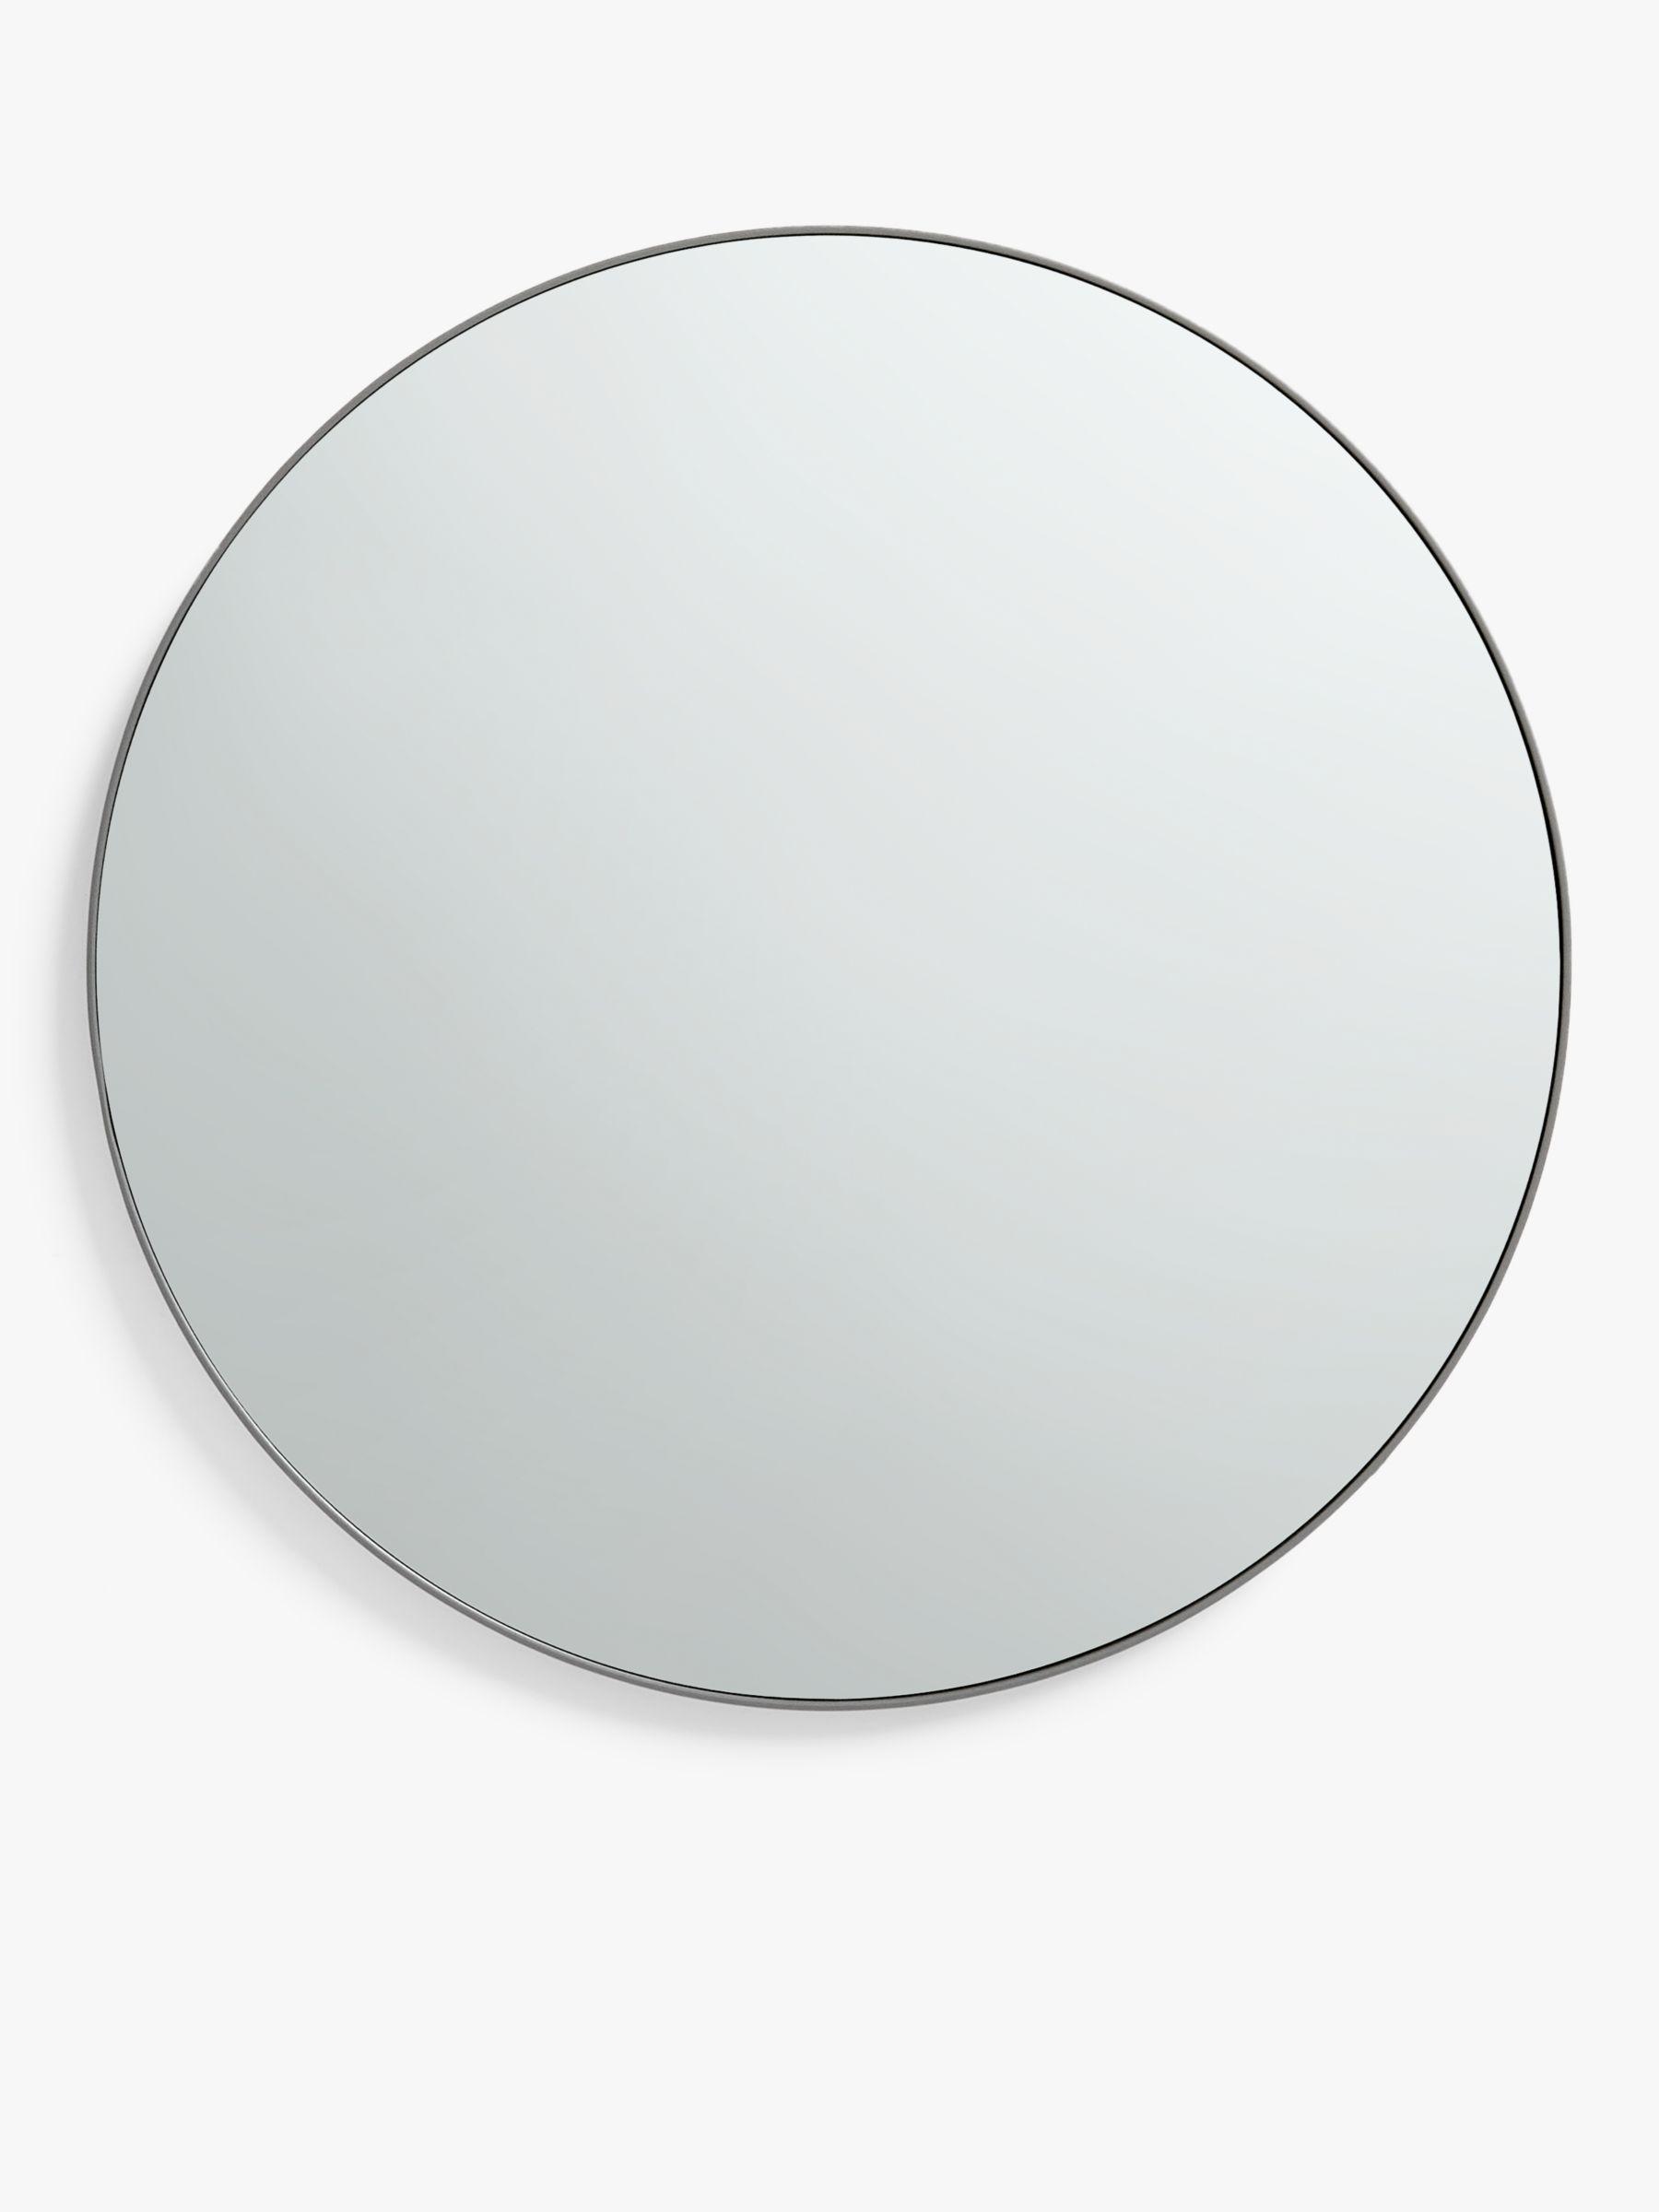 mirrors buy freestanding wall